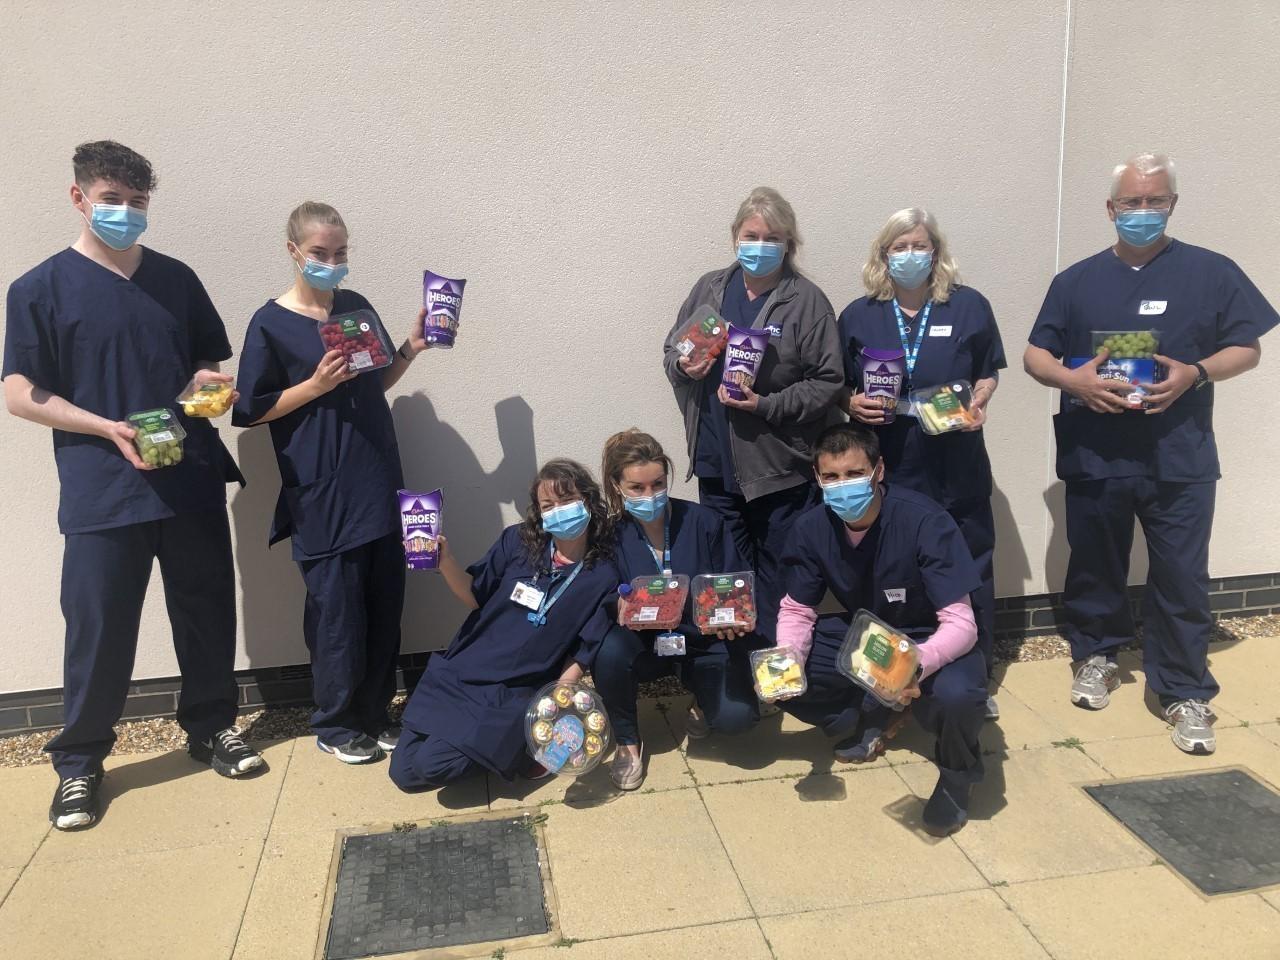 Celebrating National Nurses Day | Asda Eastbourne